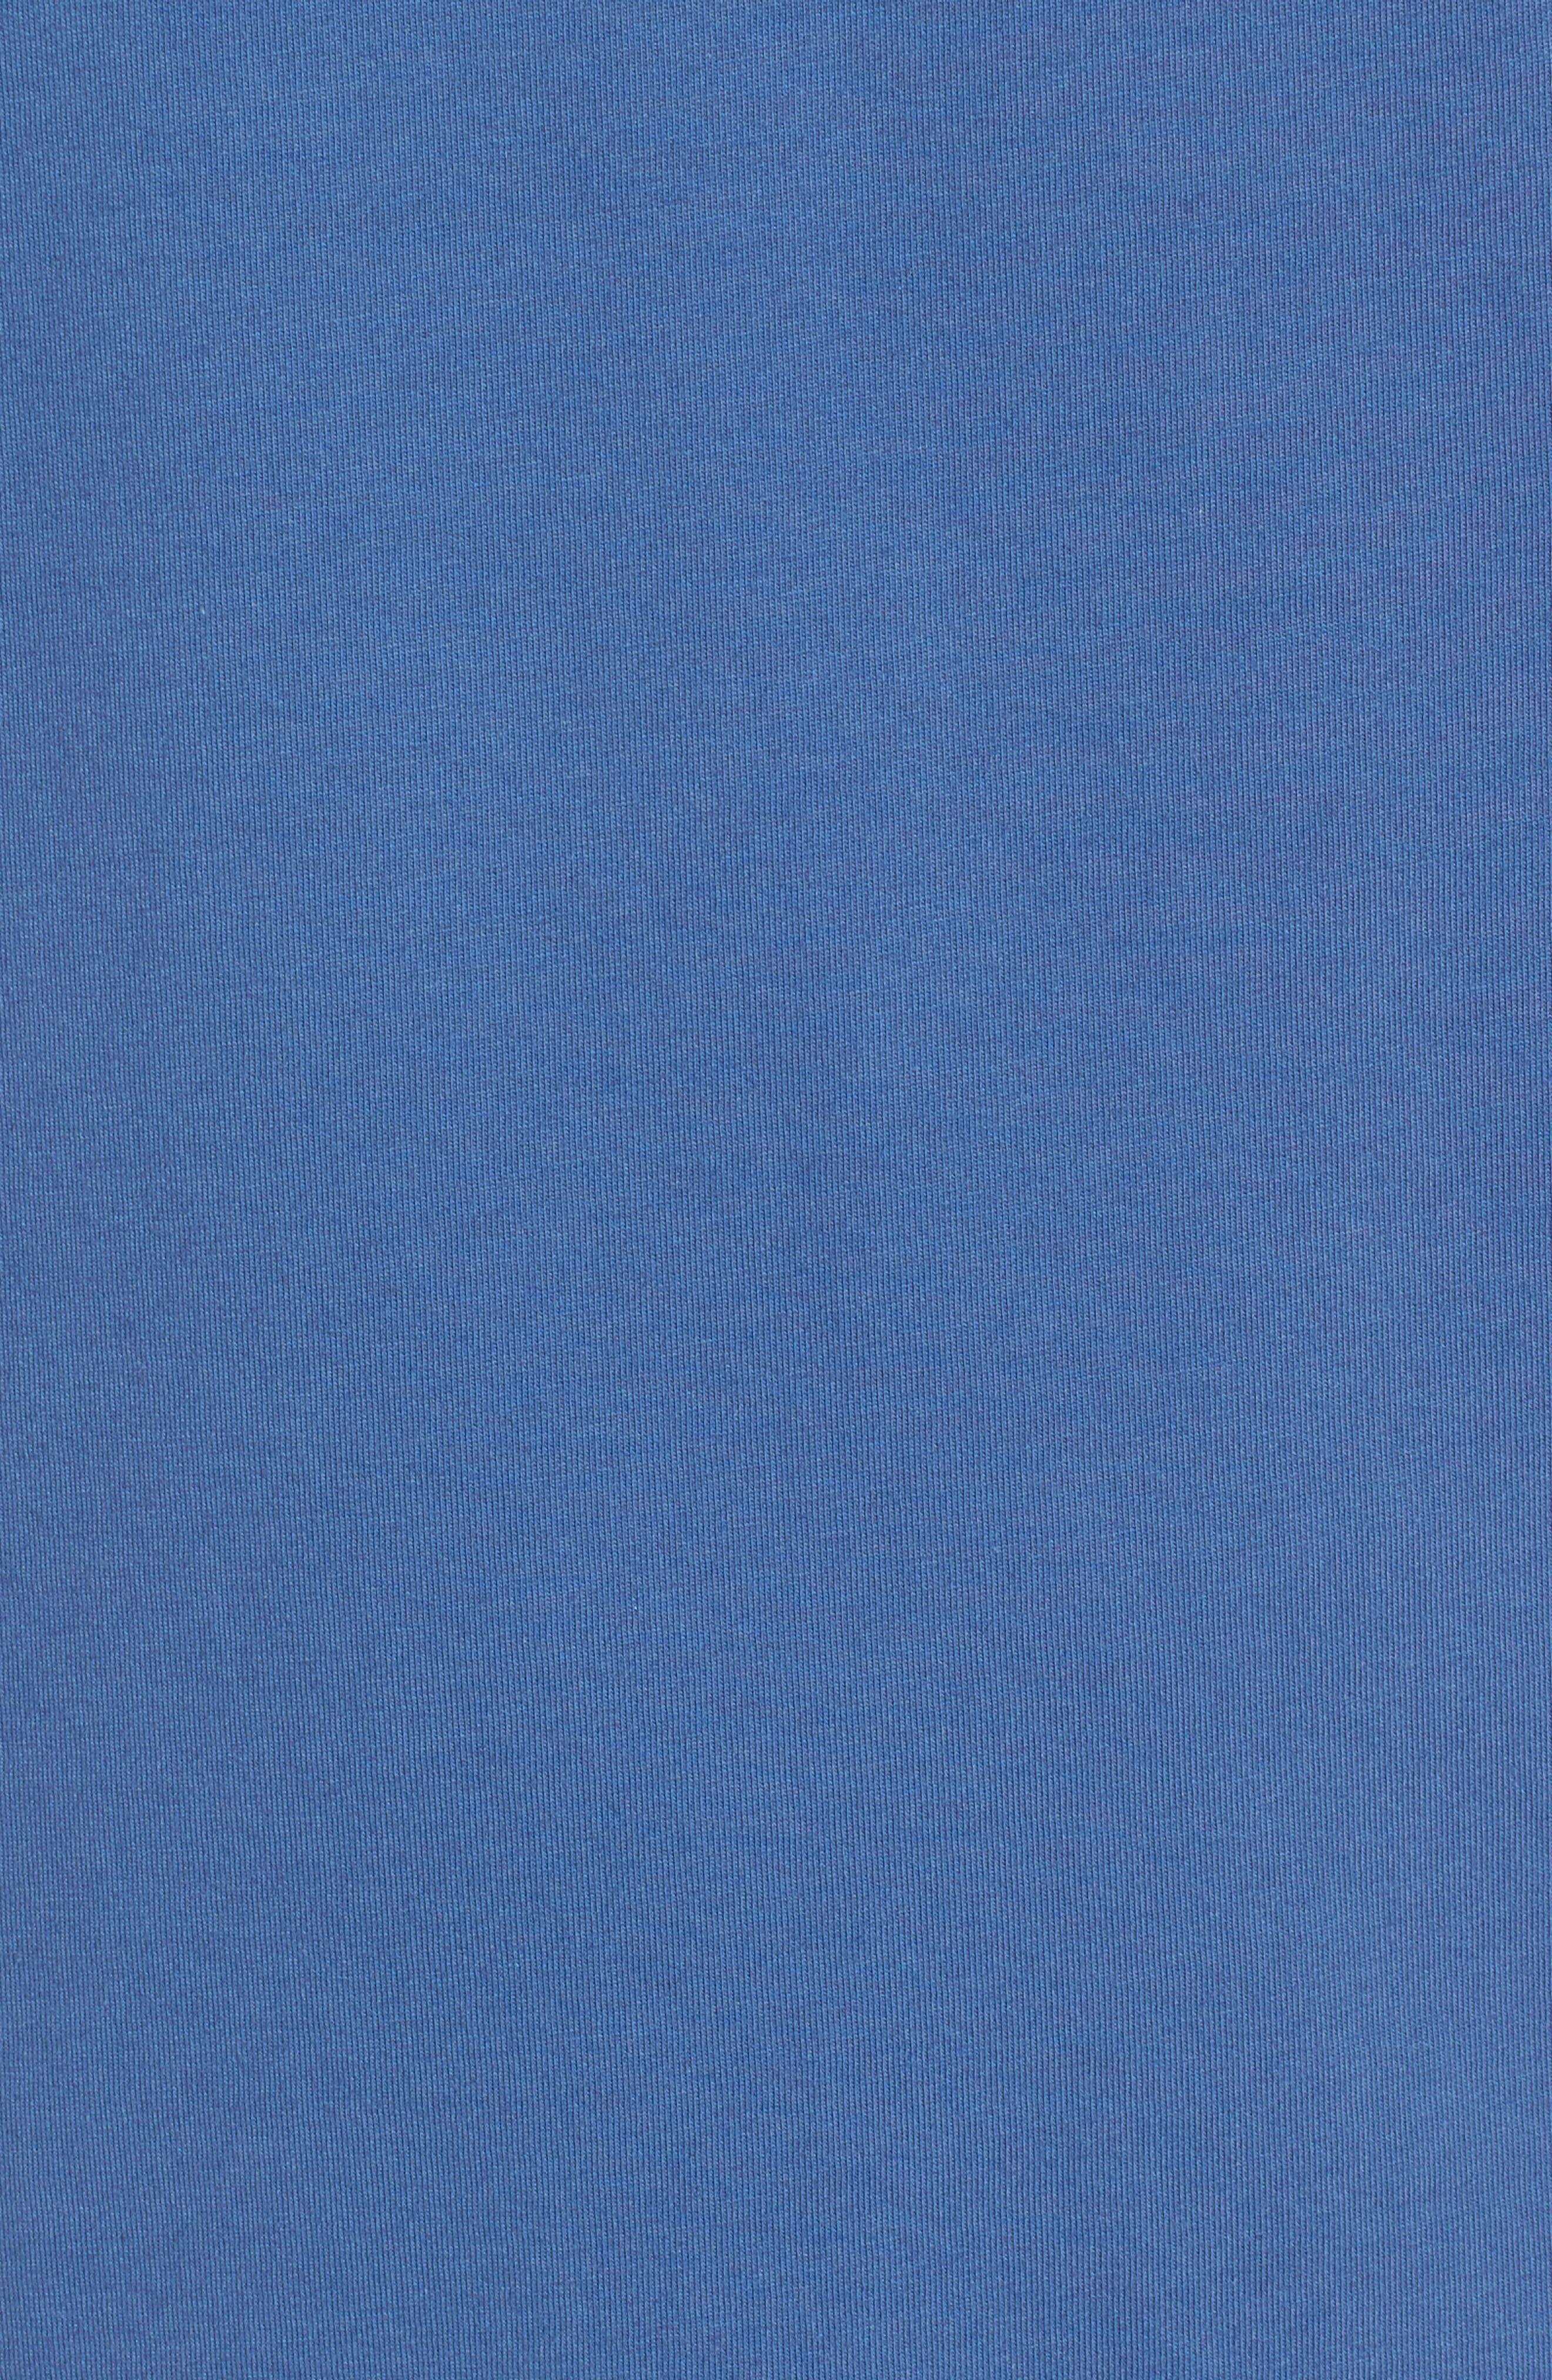 Alternate Image 5  - vineyard vines Sailfish Whale Line Graphic T-Shirt